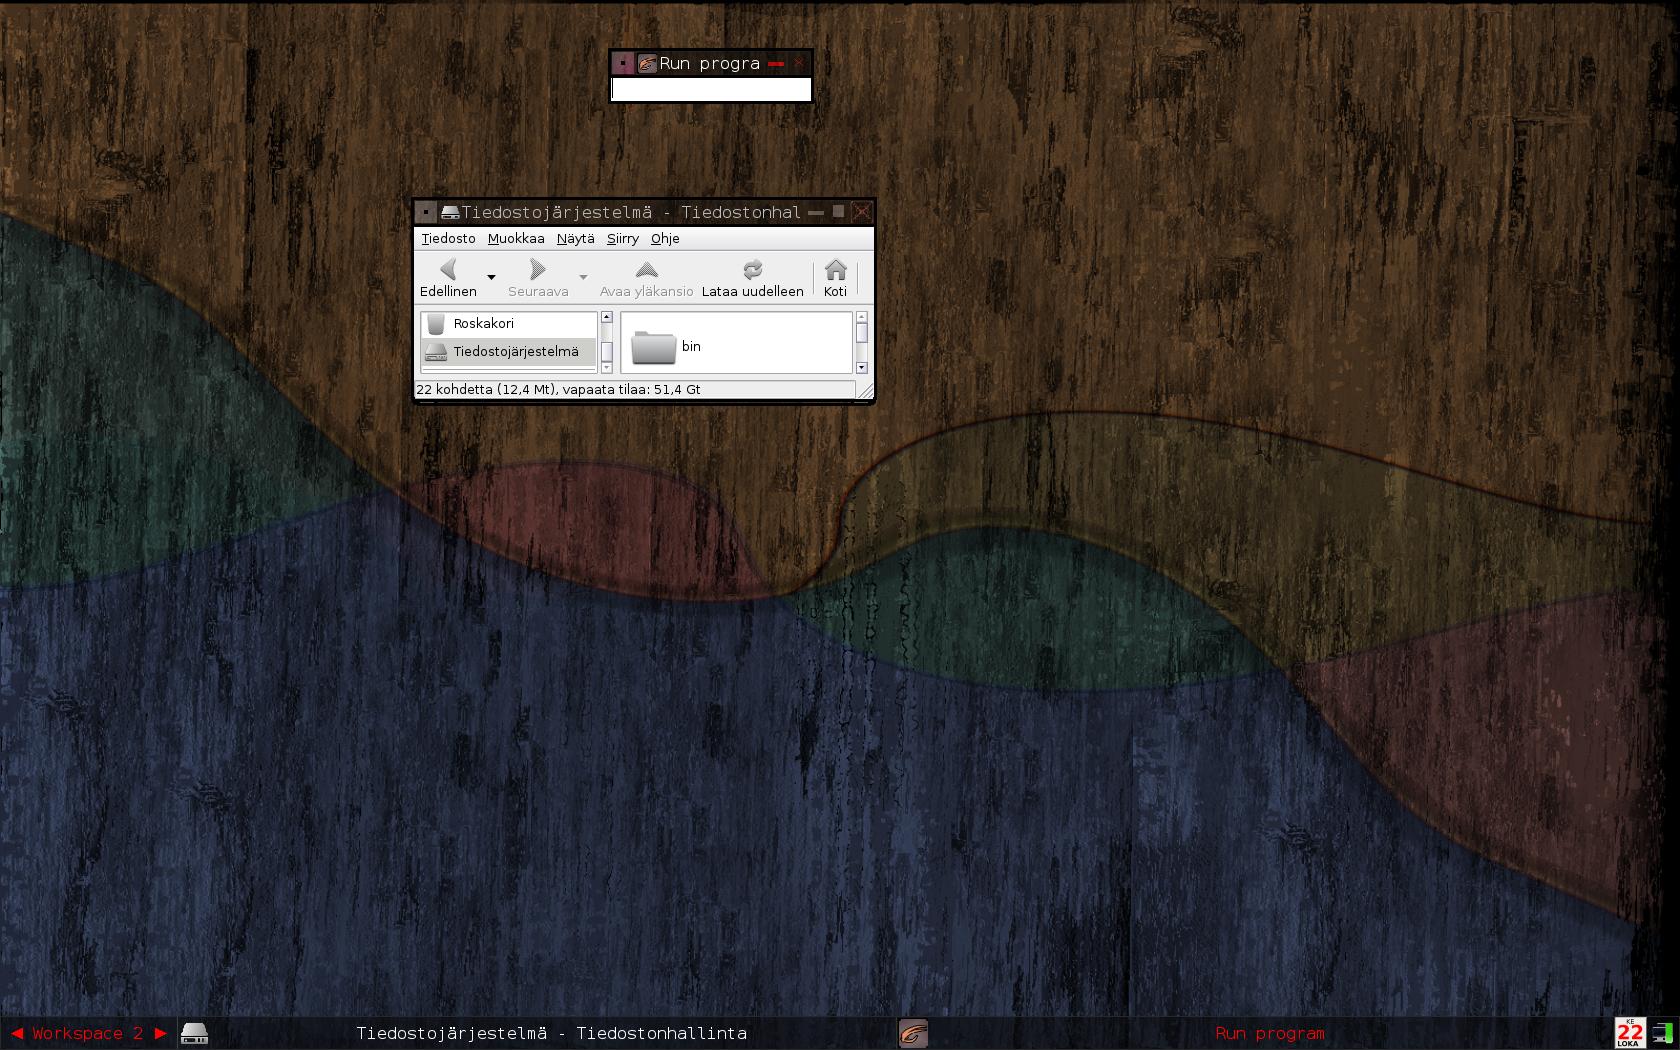 Showcasing window frames. Run dialog is selected.